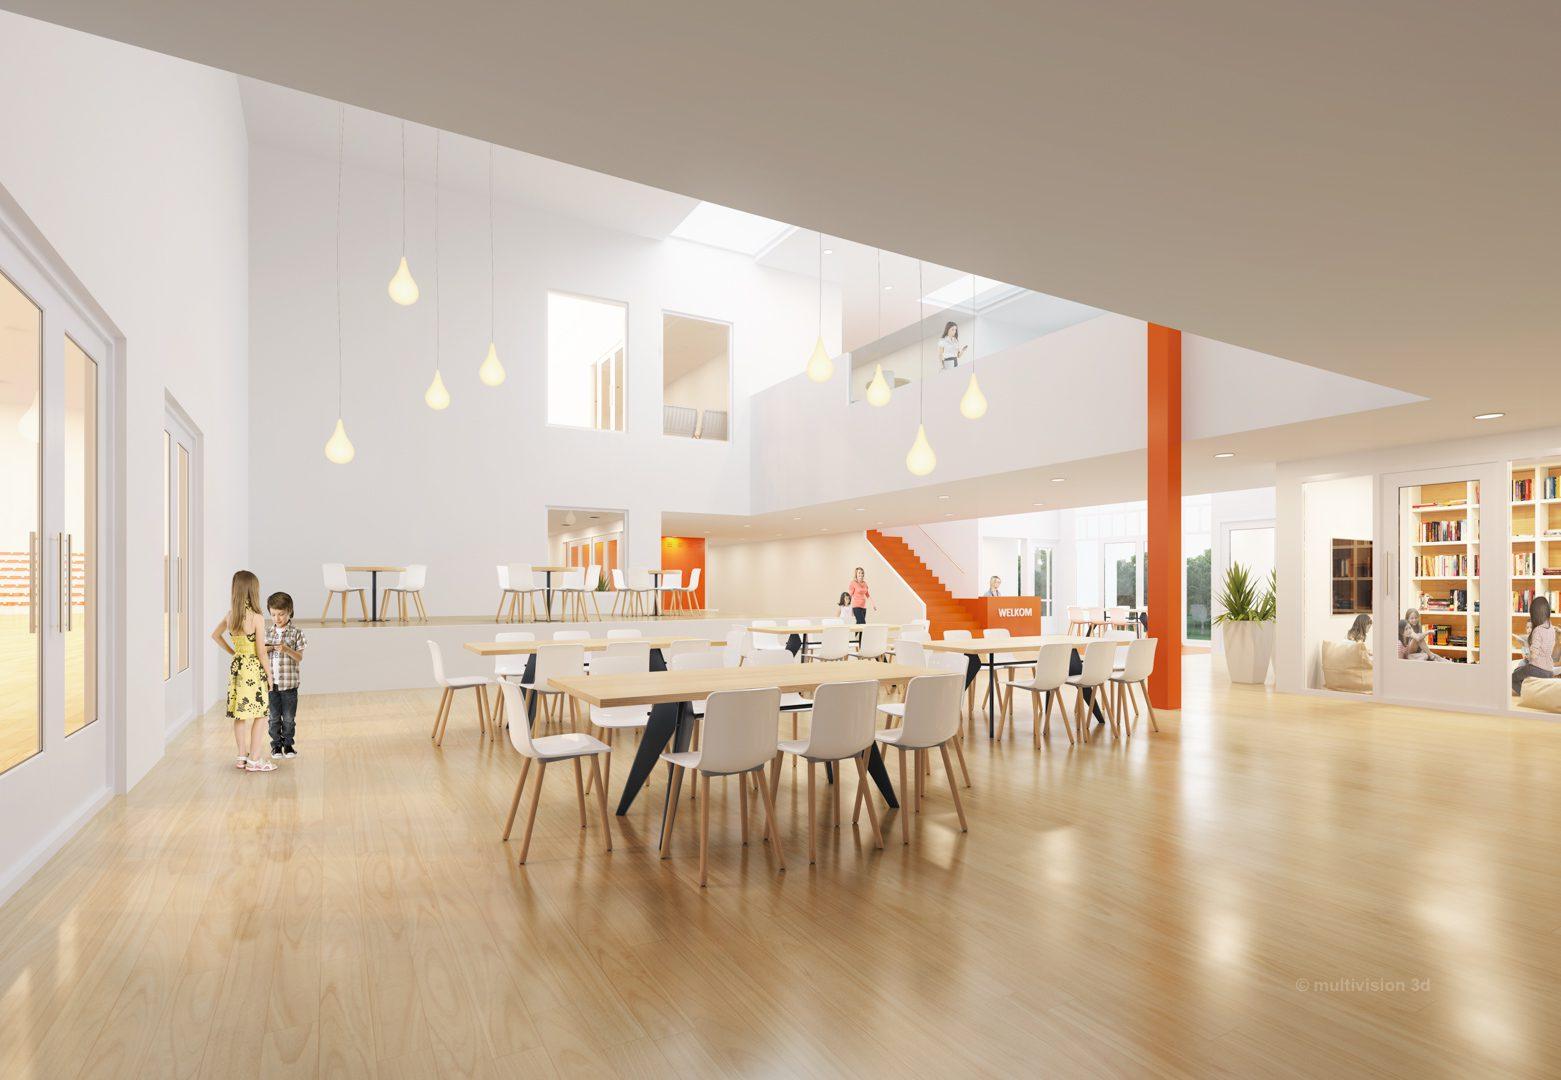 https://multivision3d.nl/blog/wp-content/uploads/2016/03/architectuur-visualisatie-interieur-gewonnen-tender-1.jpg